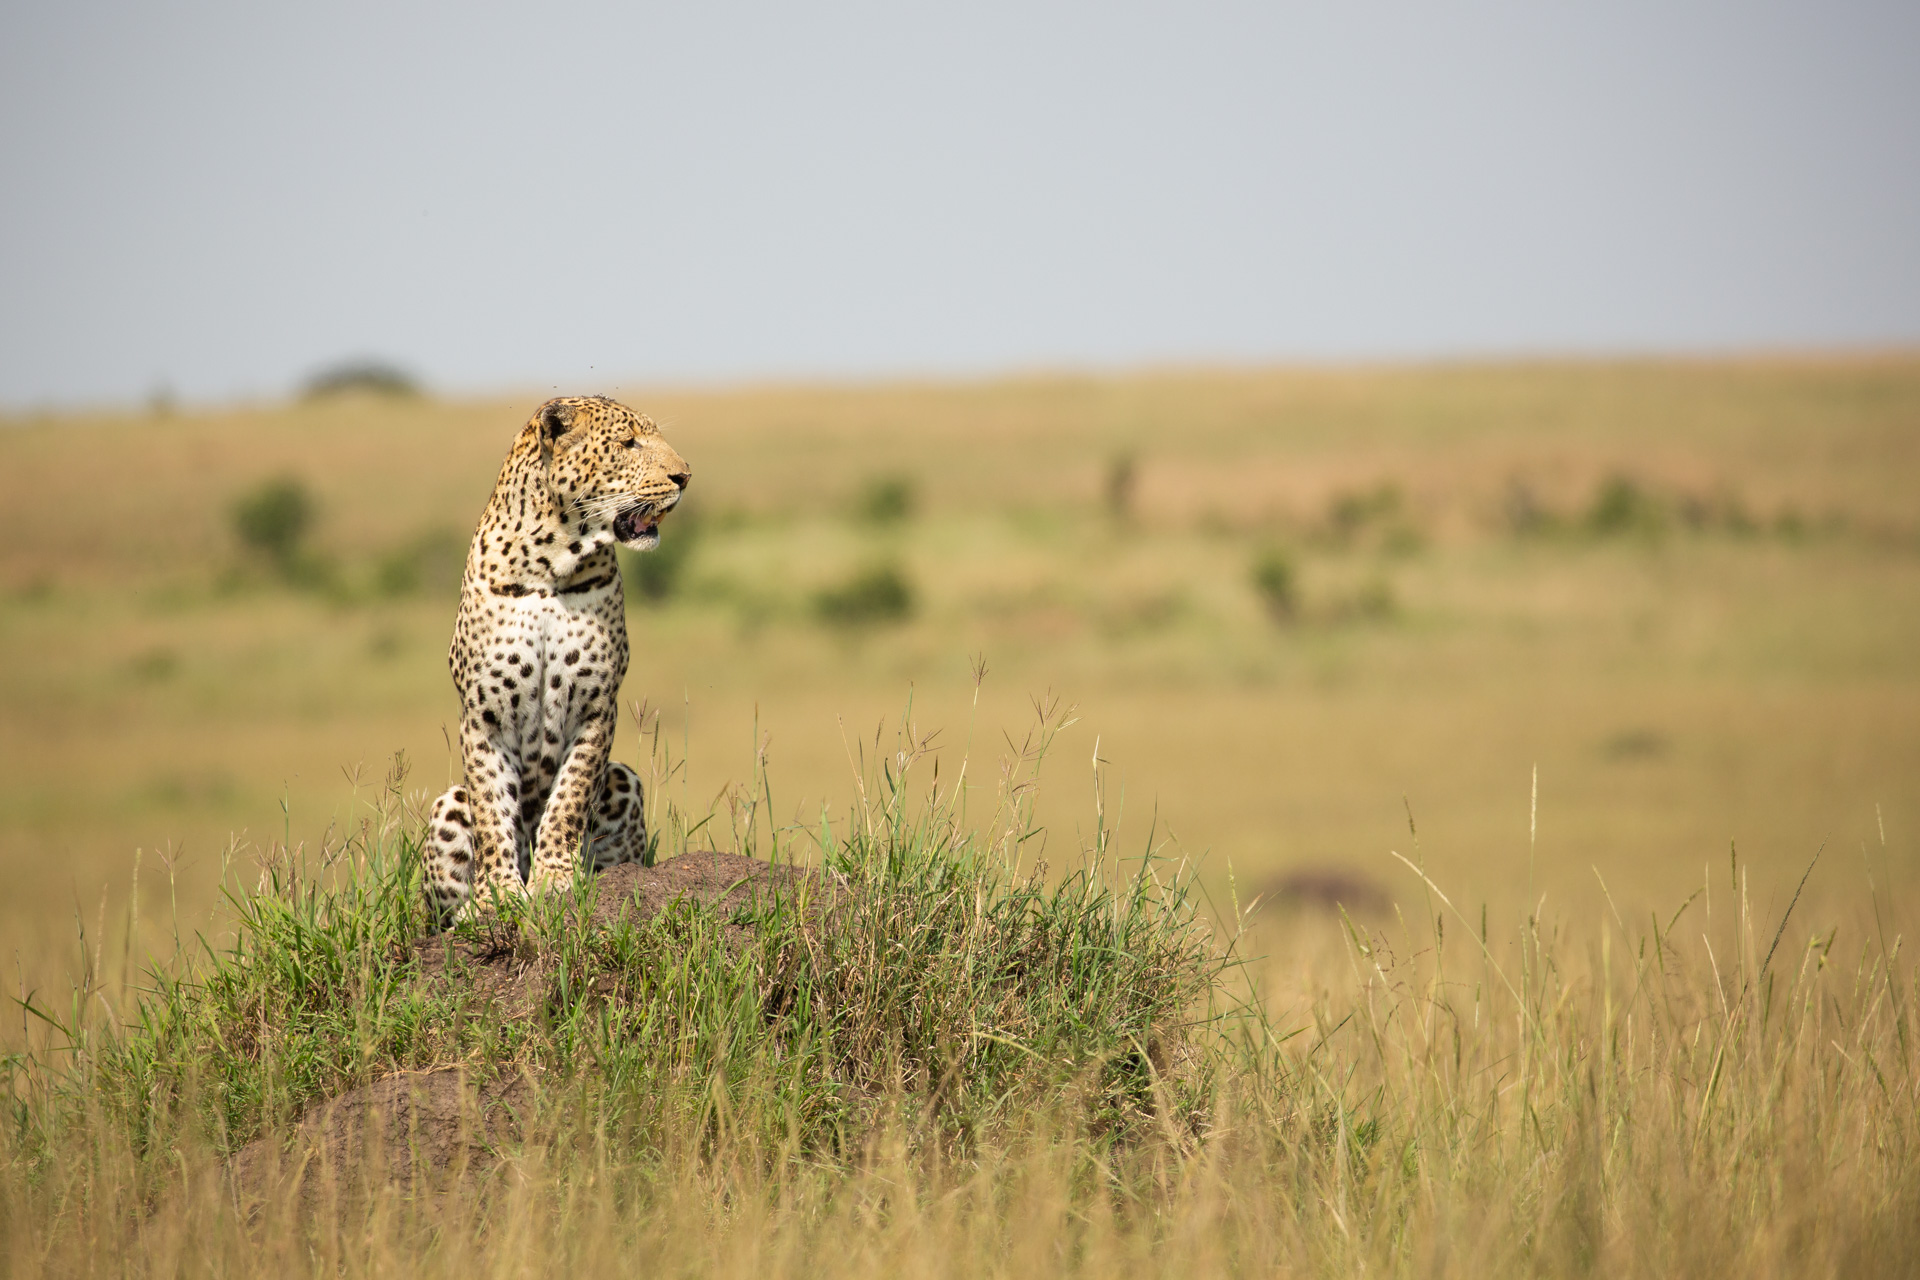 leopard on mound